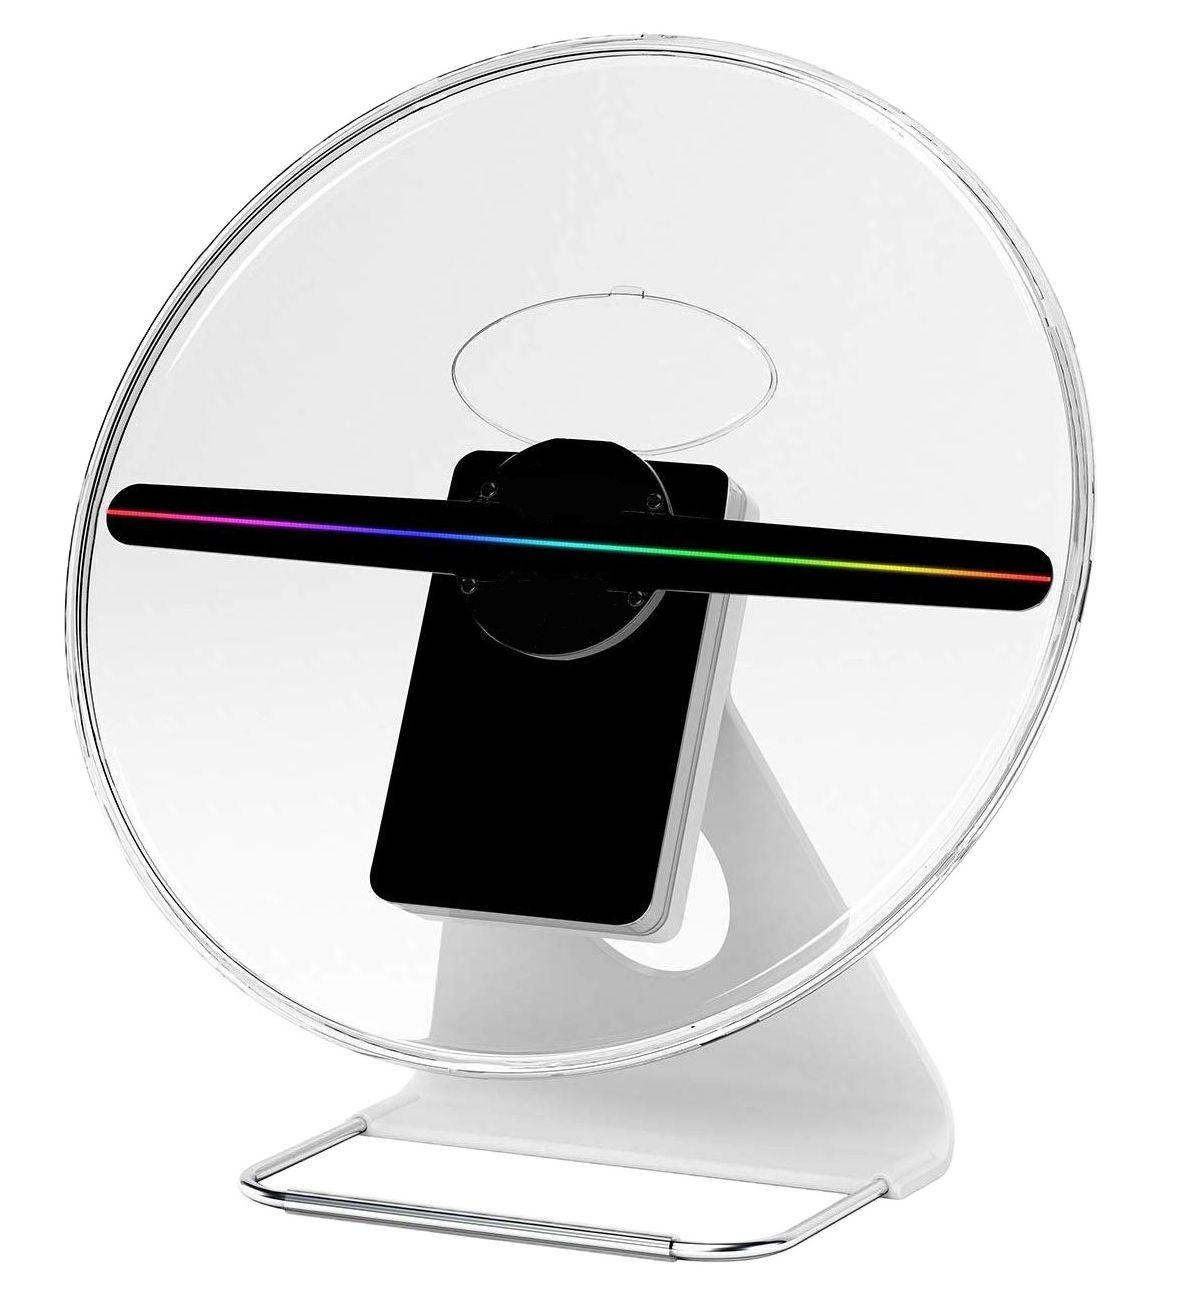 AOV A12 Portable 3D Hologram Fan|||||||||||